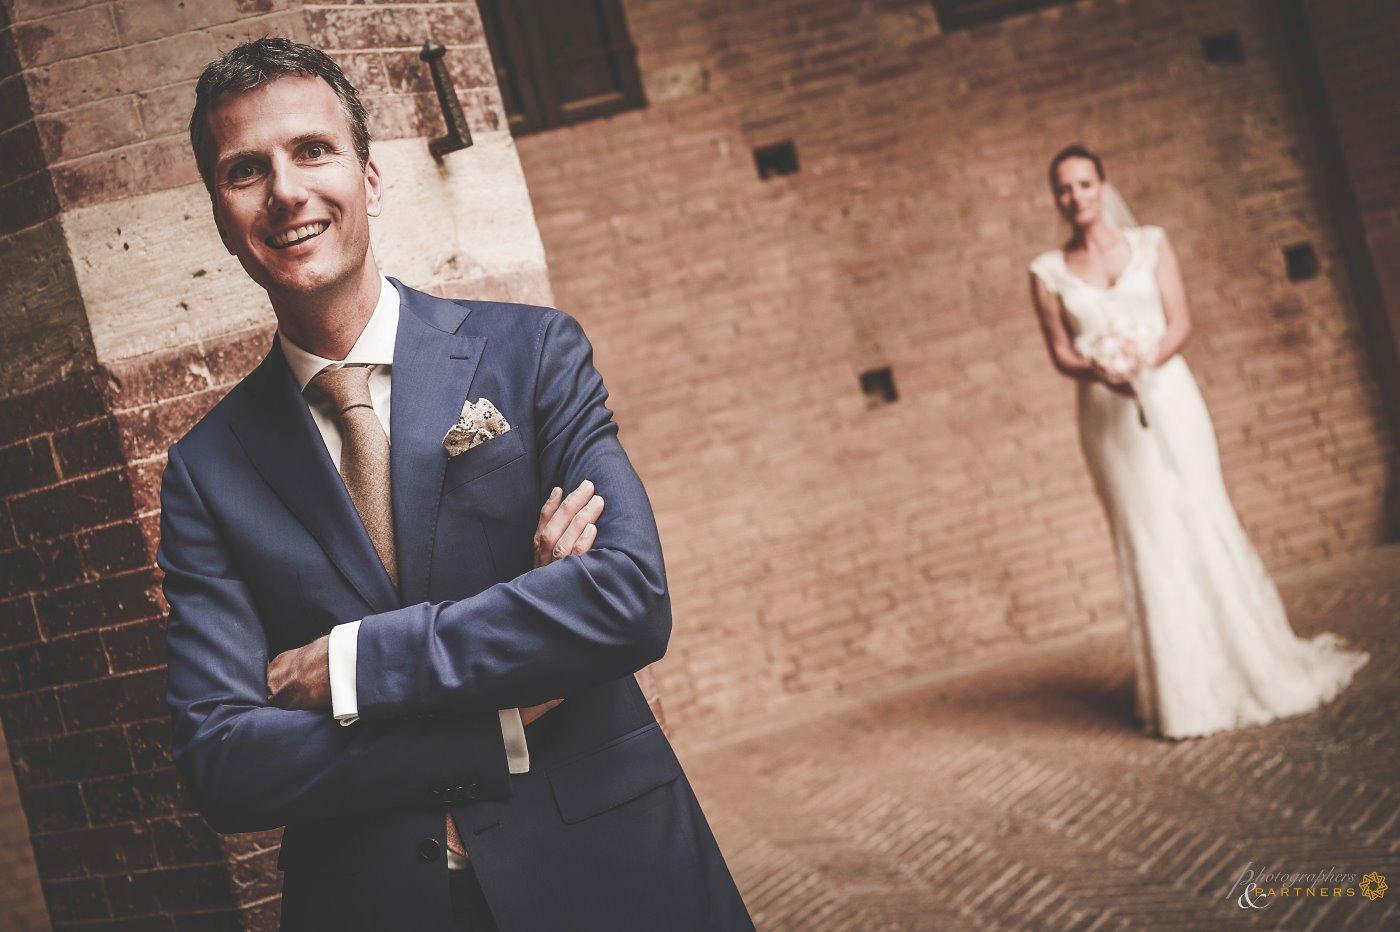 photographer_weddings_siena_11.jpg